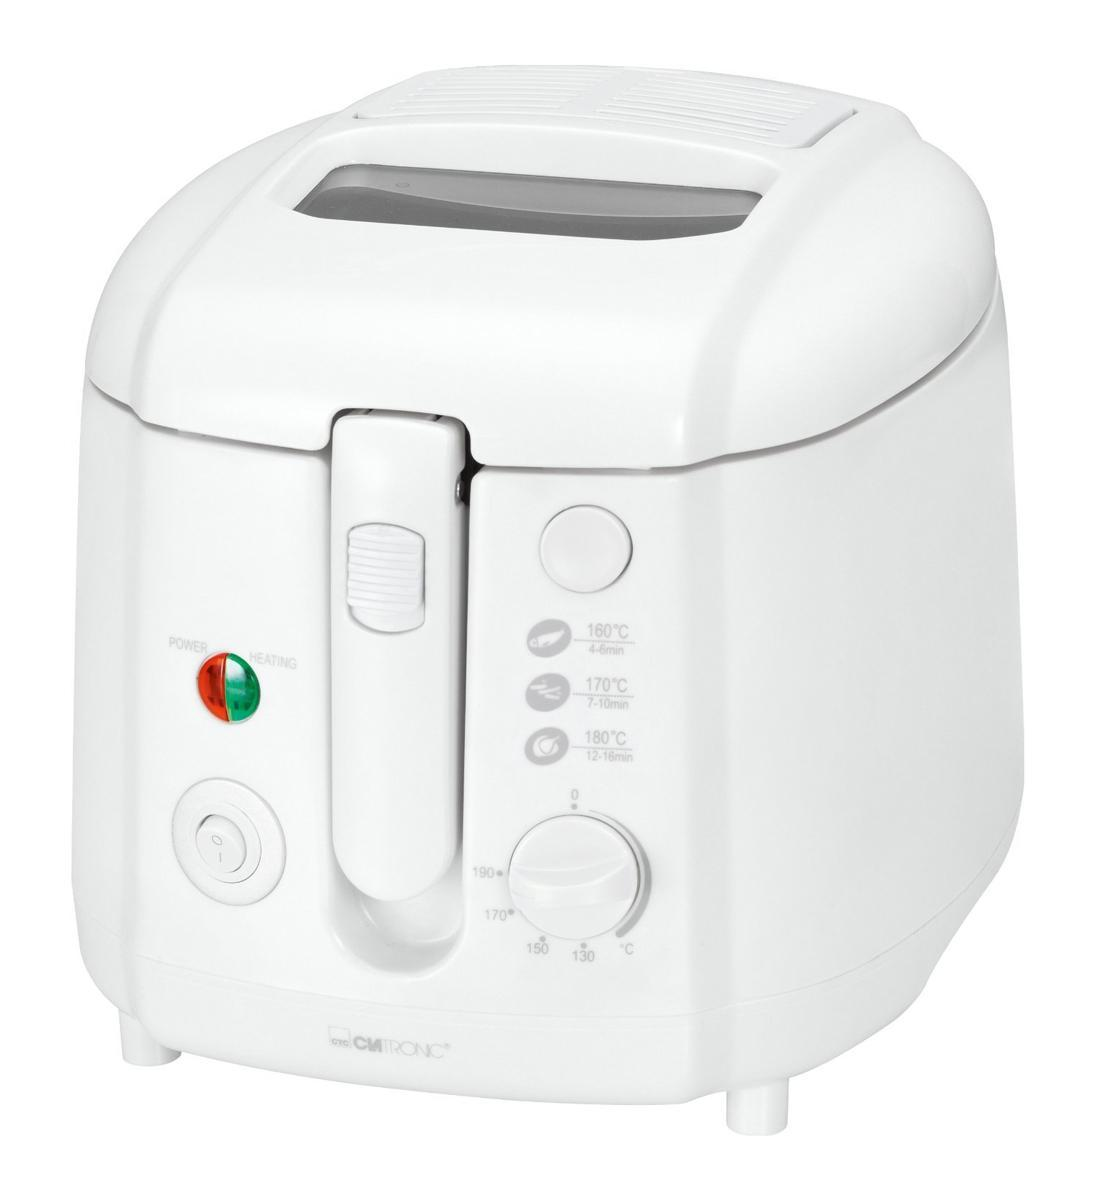 Clatronic FR 3390, White фритюрница - Фритюрницы